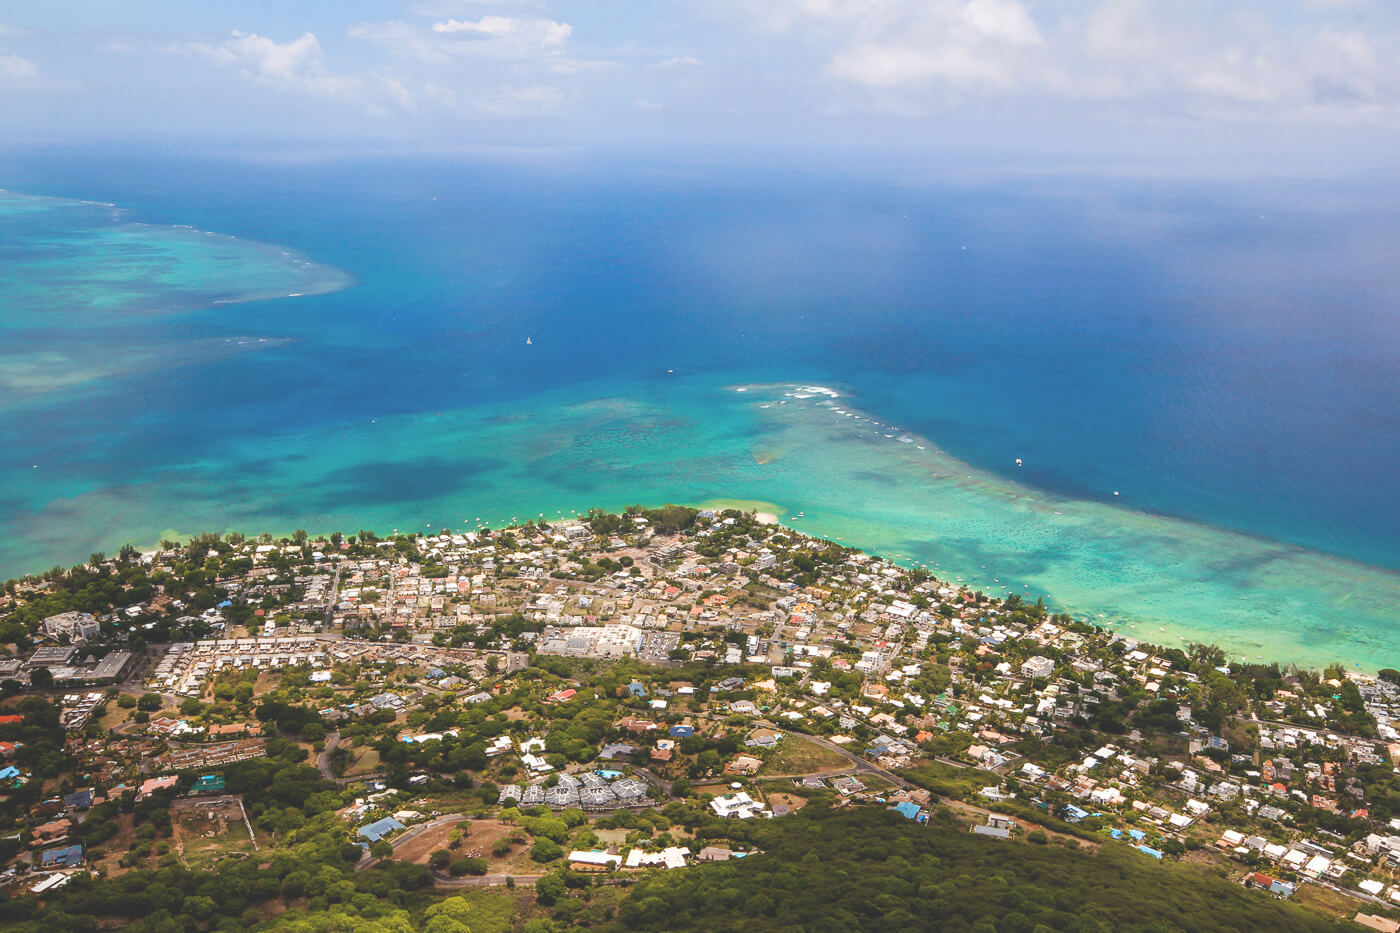 mauritius-sehenswuerdigkeiten-highlights-blick-tamarin-tourelle